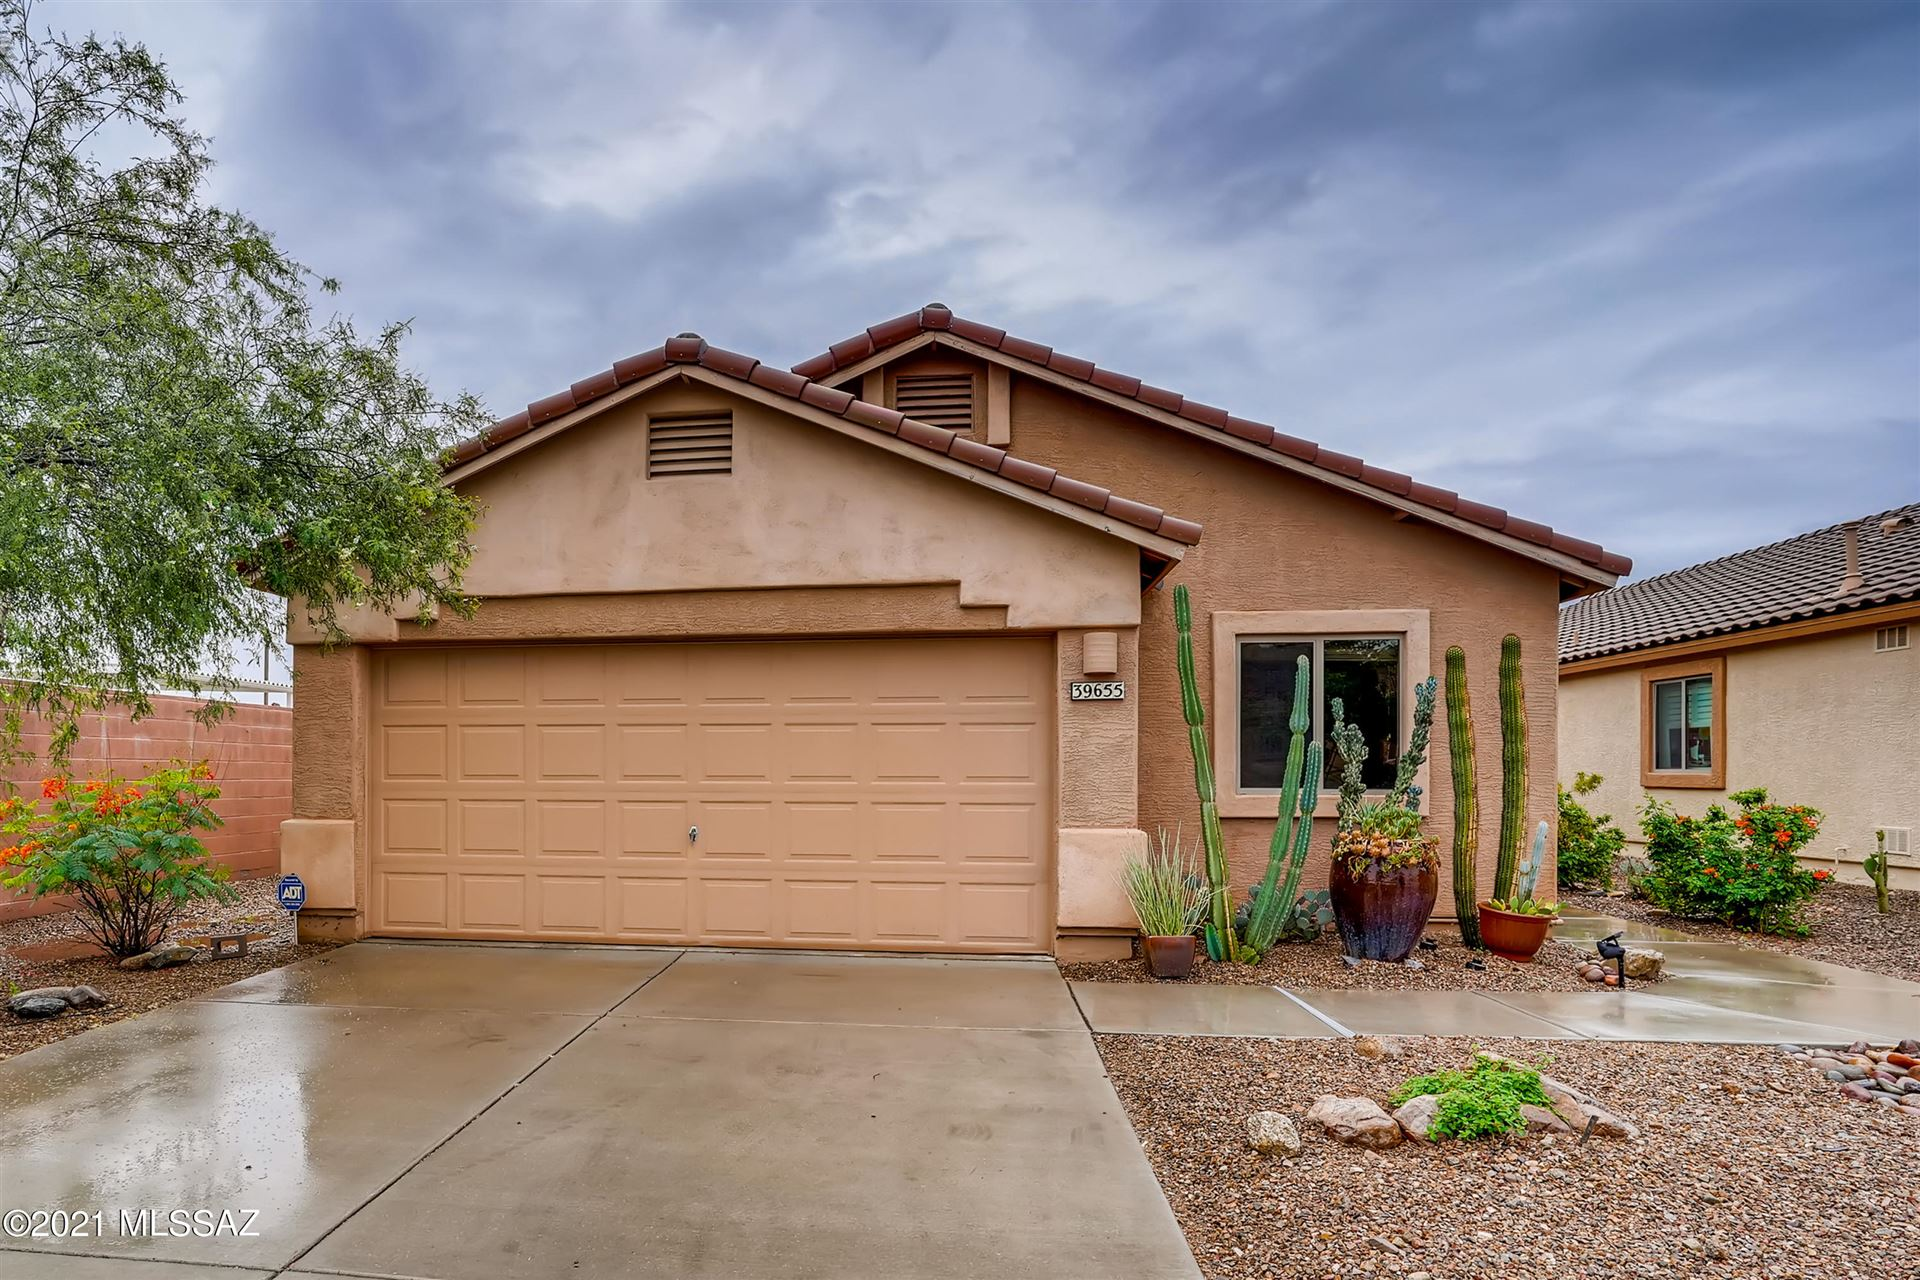 39655 S Diamond Bay Drive, Tucson, AZ 85739 - MLS#: 22118859